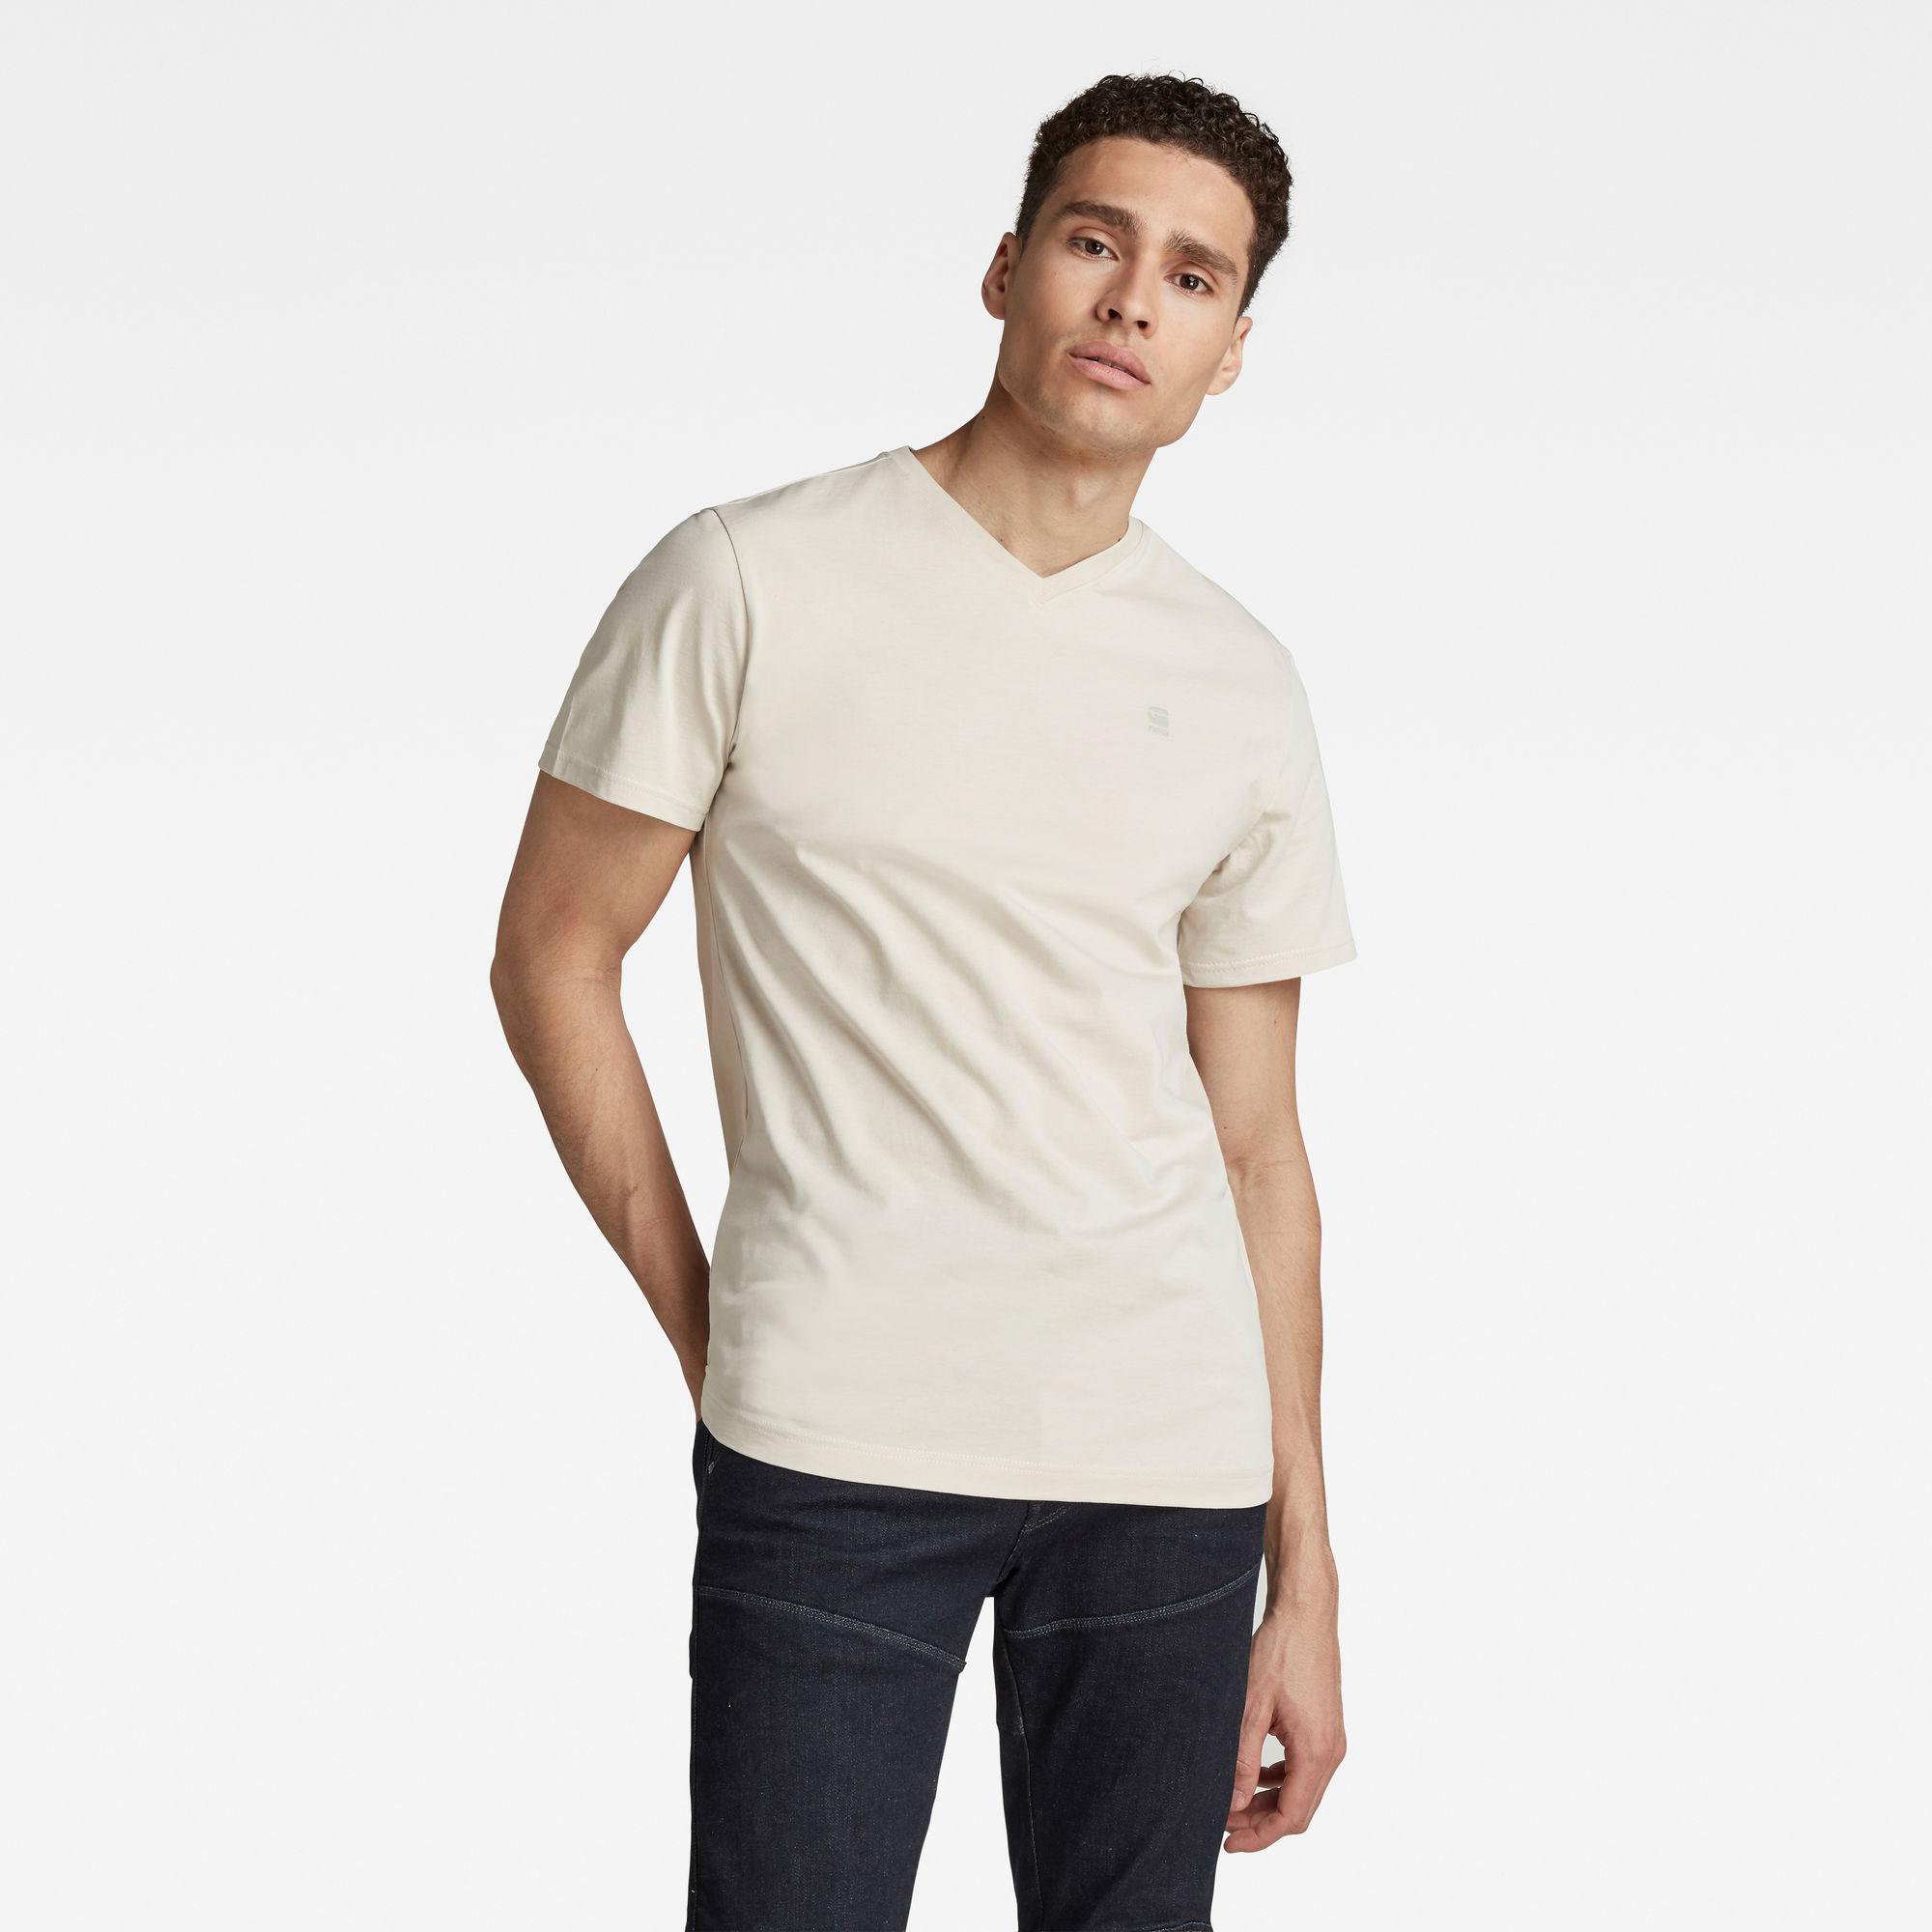 G-Star RAW Heren Base-S T-Shirt Beige